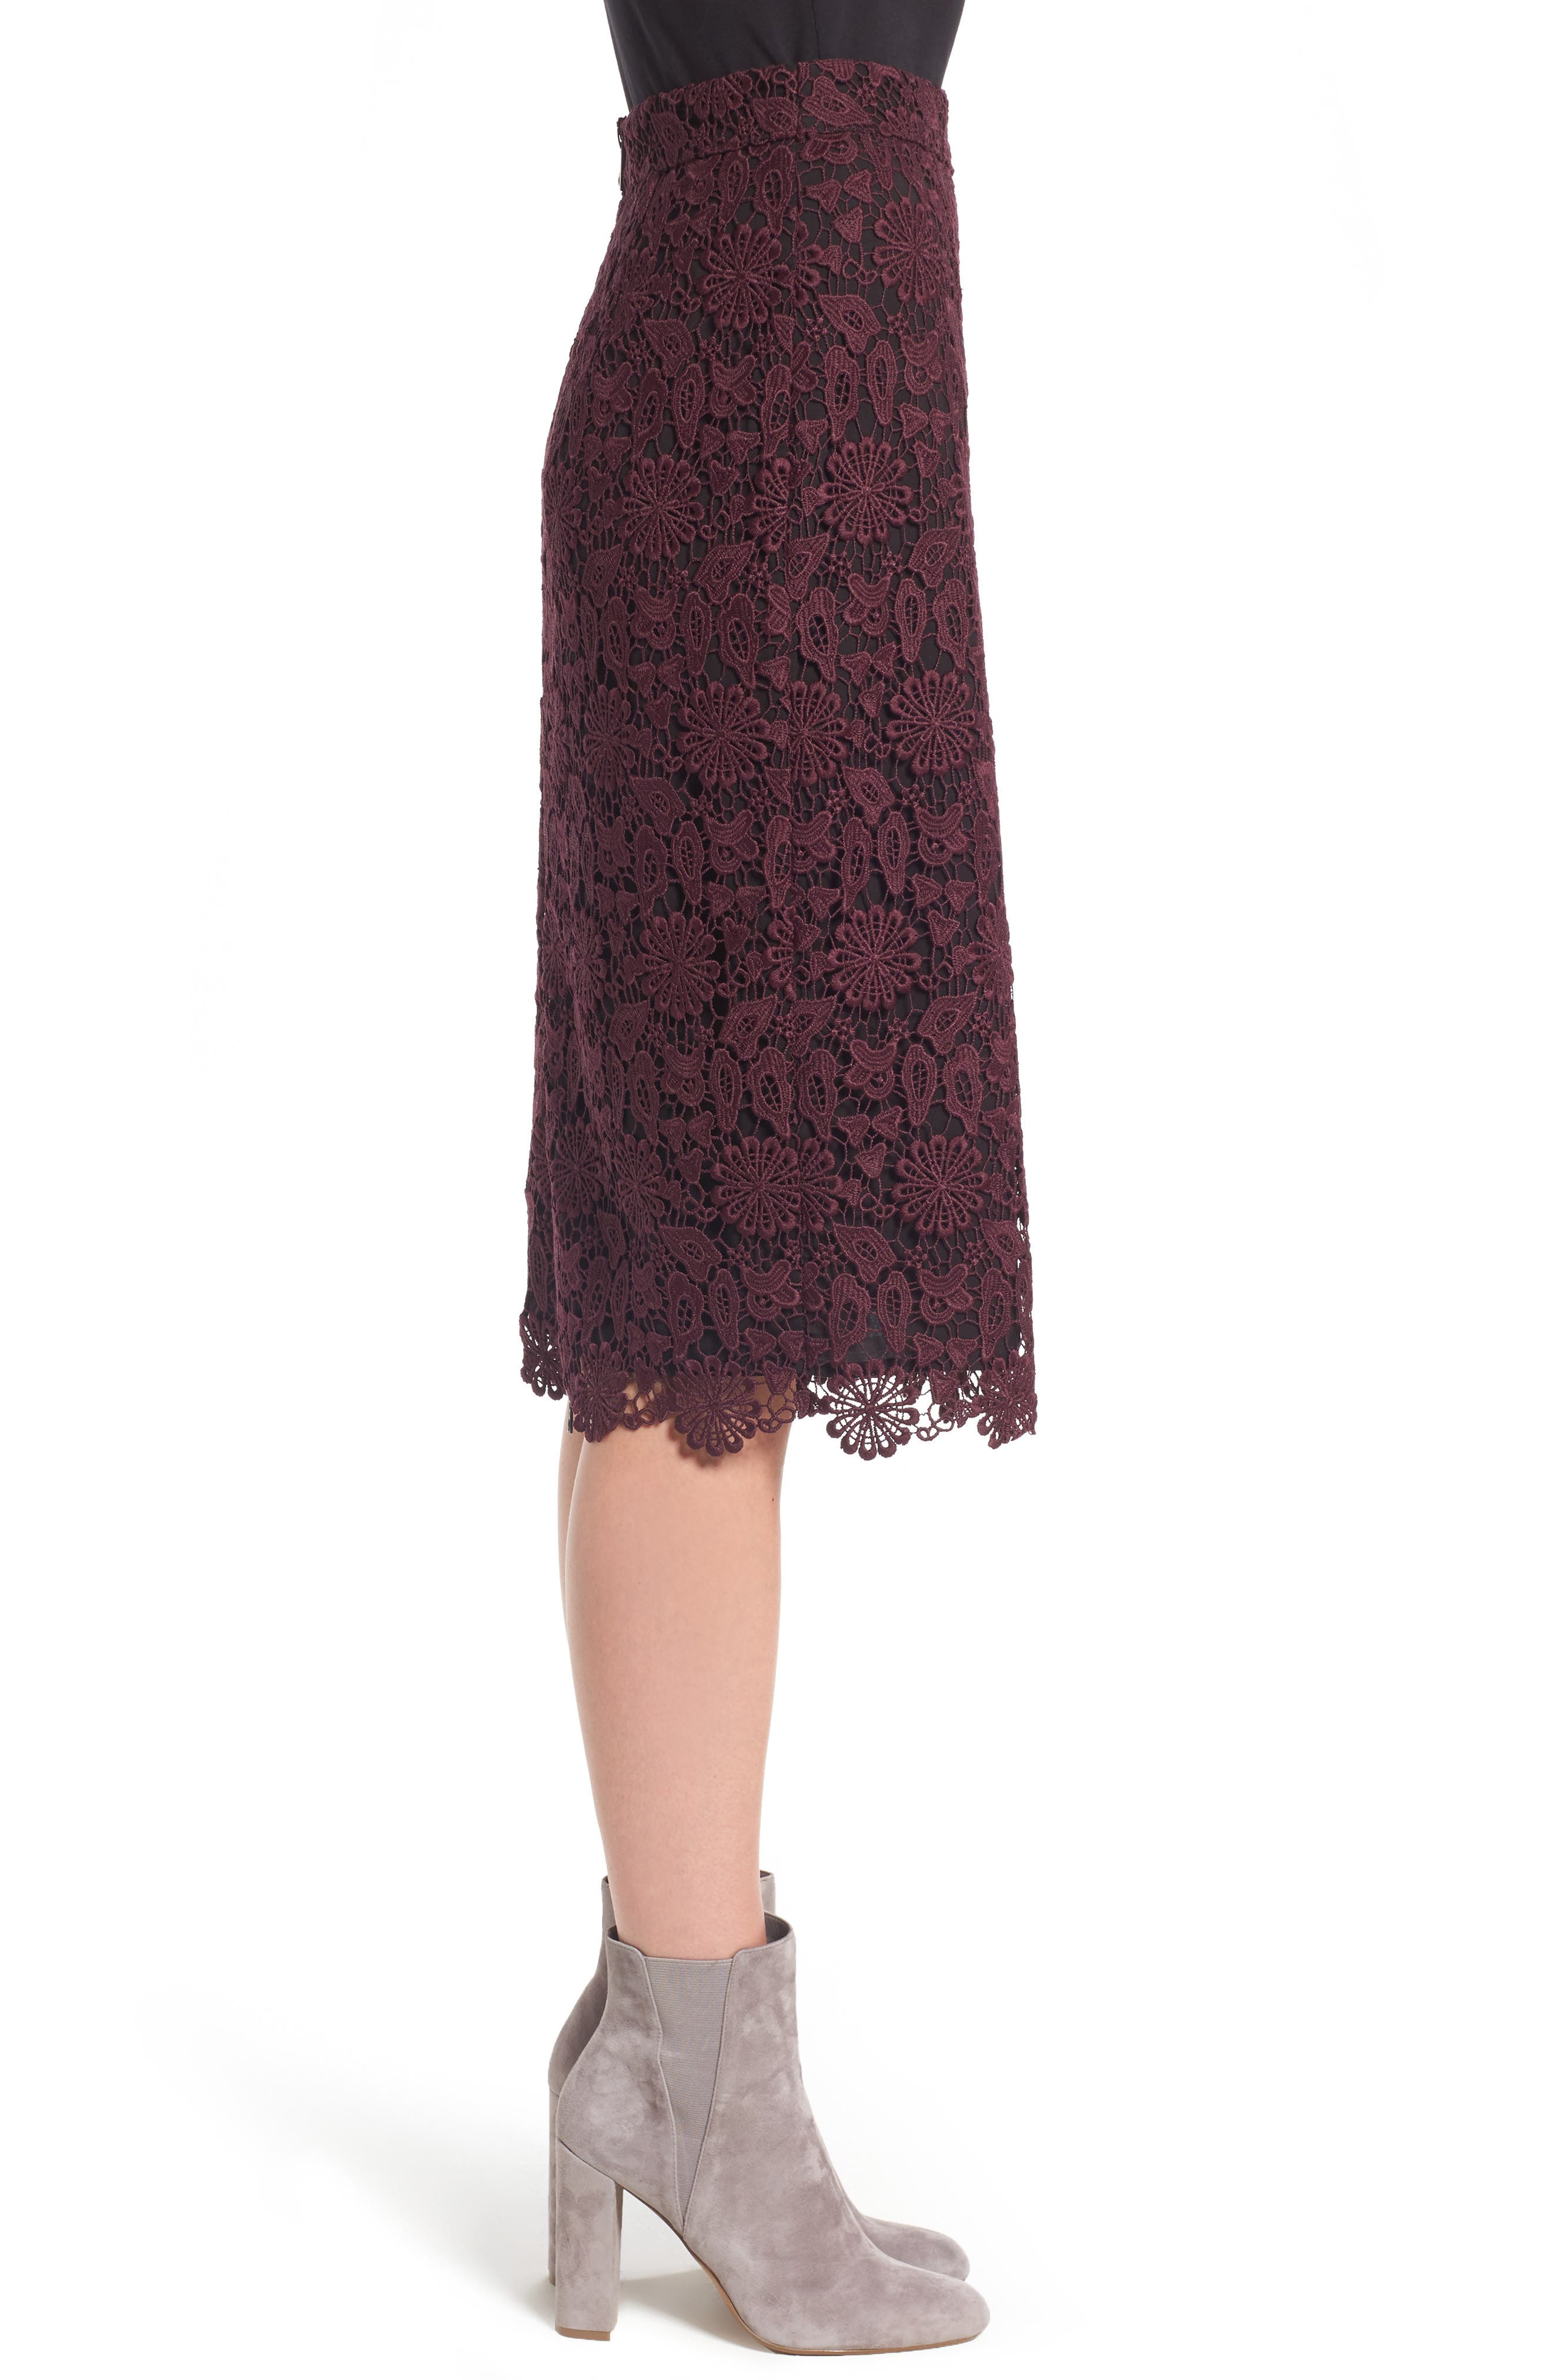 Lace Pencil Skirt,                             Alternate thumbnail 3, color,                             930